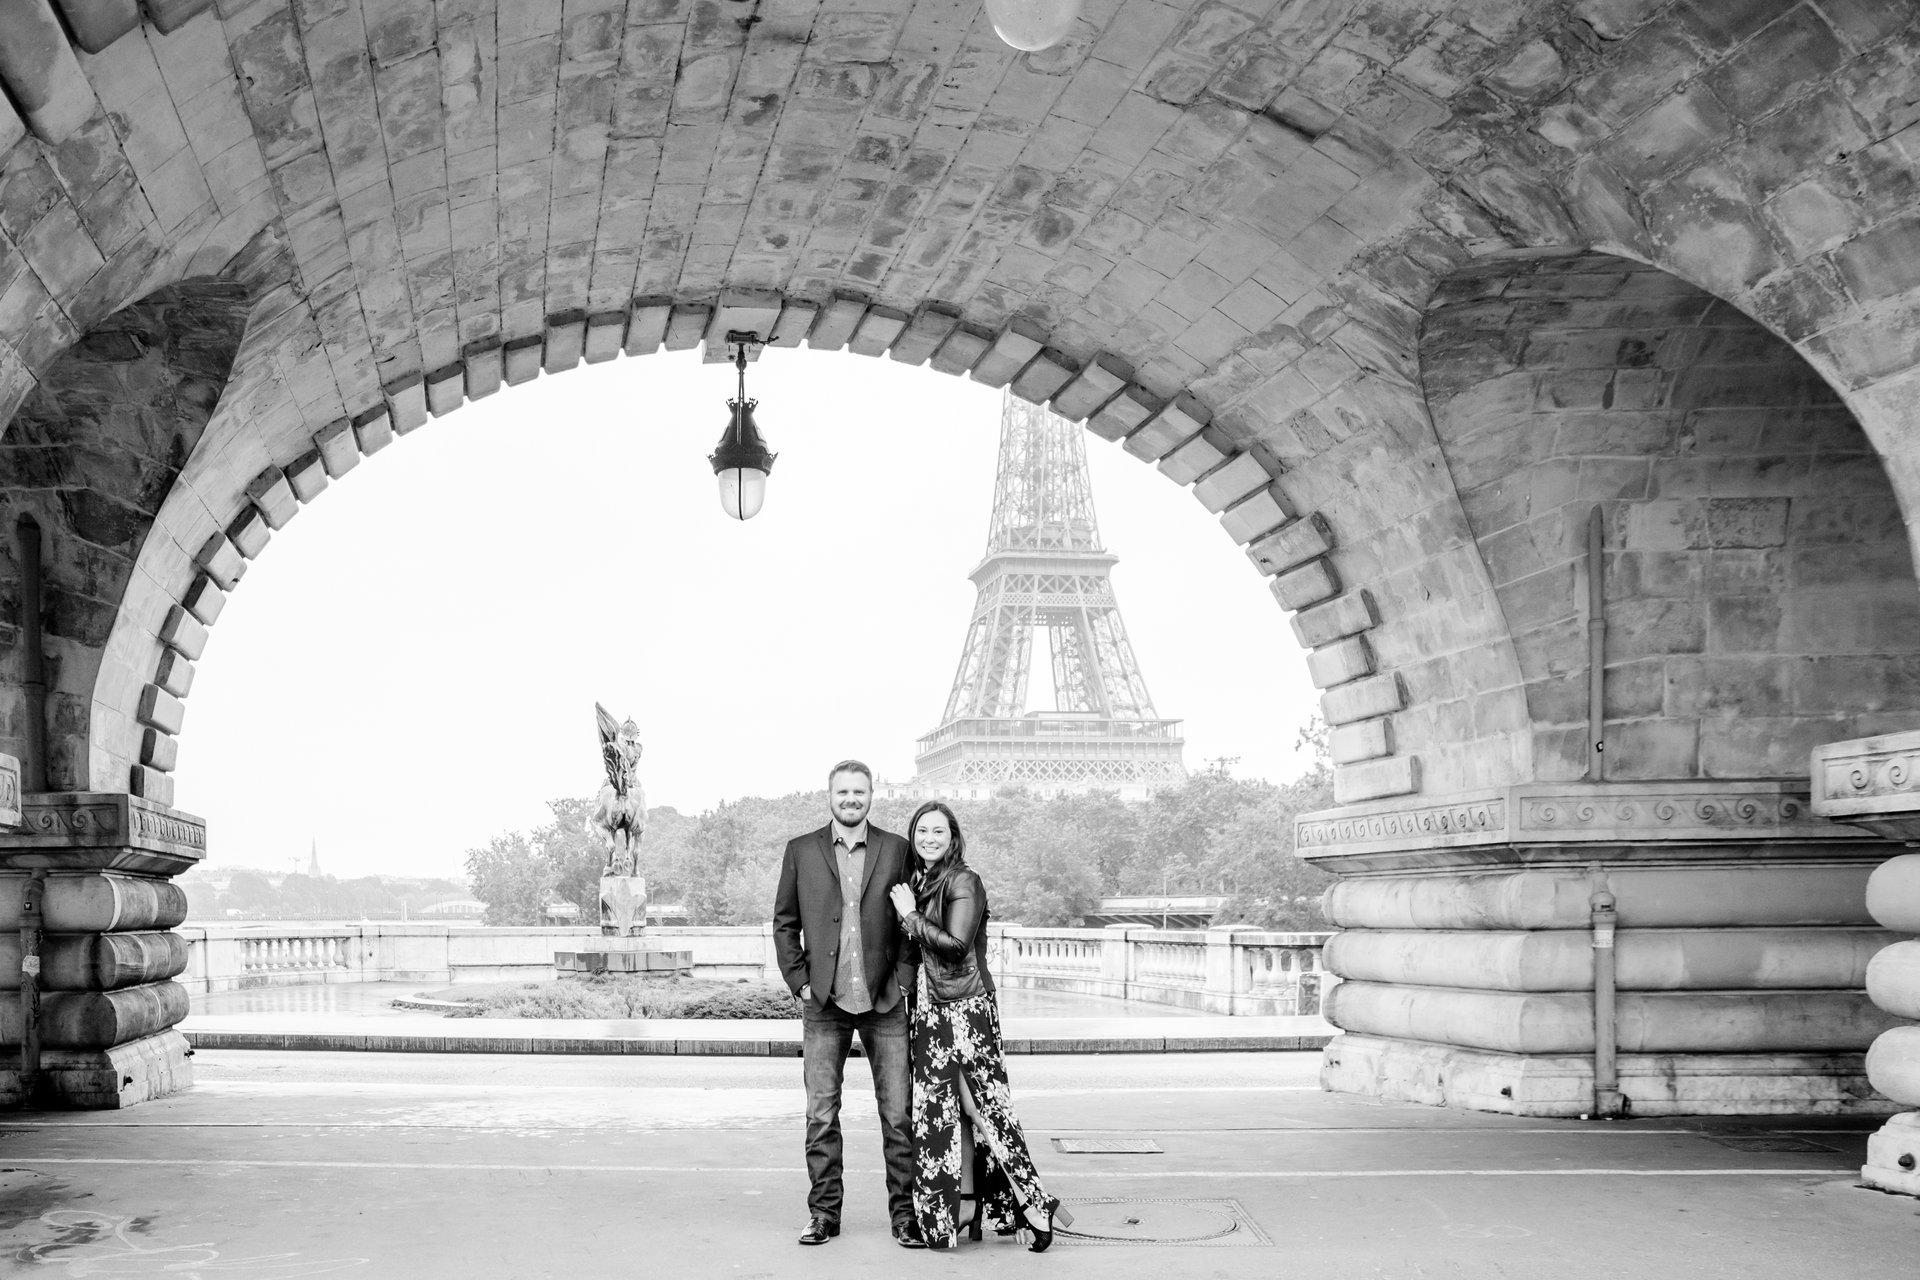 Paris-France-travel-story-Flytographer-25